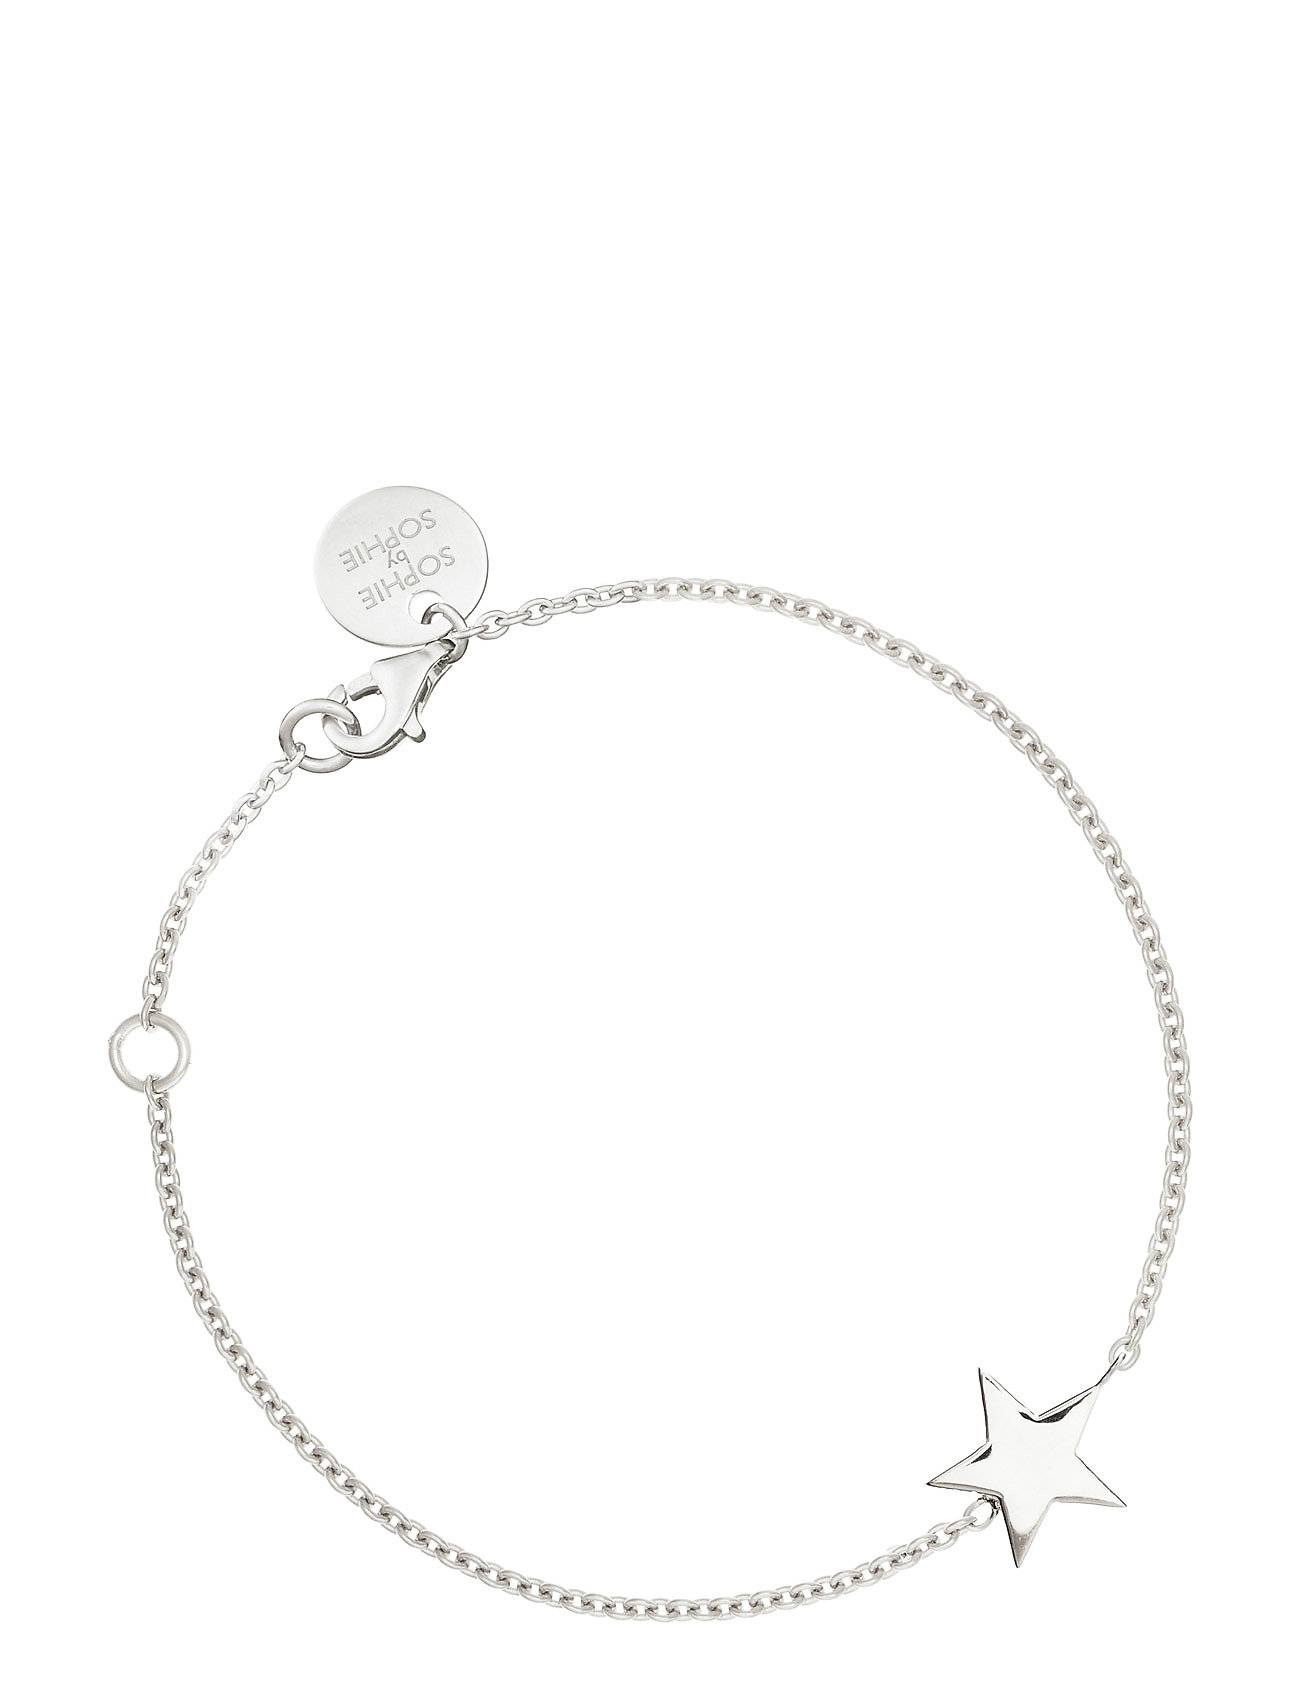 SOPHIE by SOPHIE Star Bracelet Accessories Jewellery Bracelets Chain Bracelets Hopea SOPHIE By SOPHIE